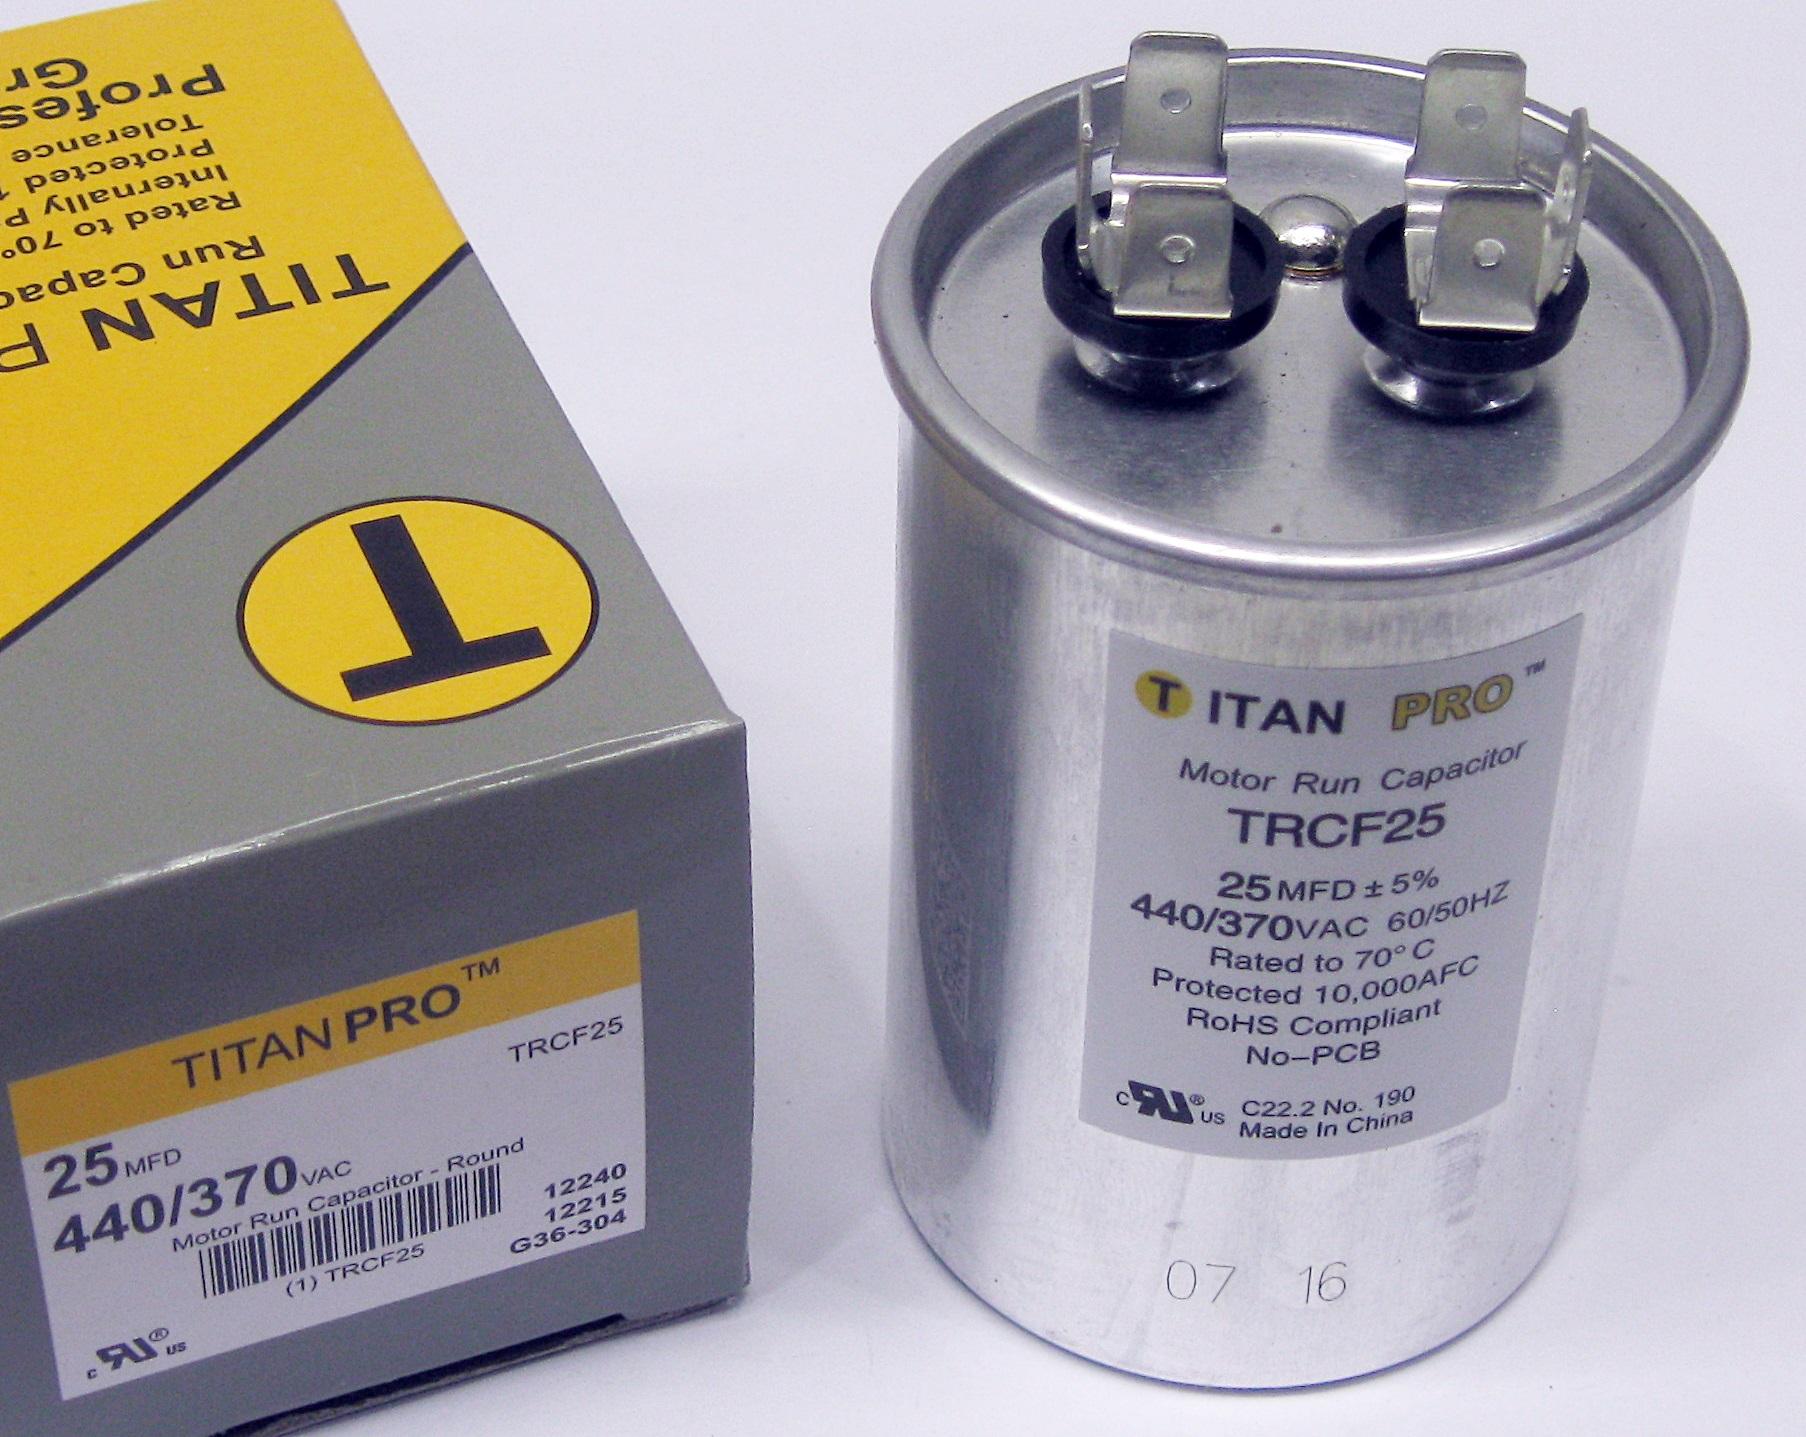 Titanpro Trcf25 Hvac Round Motor Run Capacitor 25 Mfd Uf